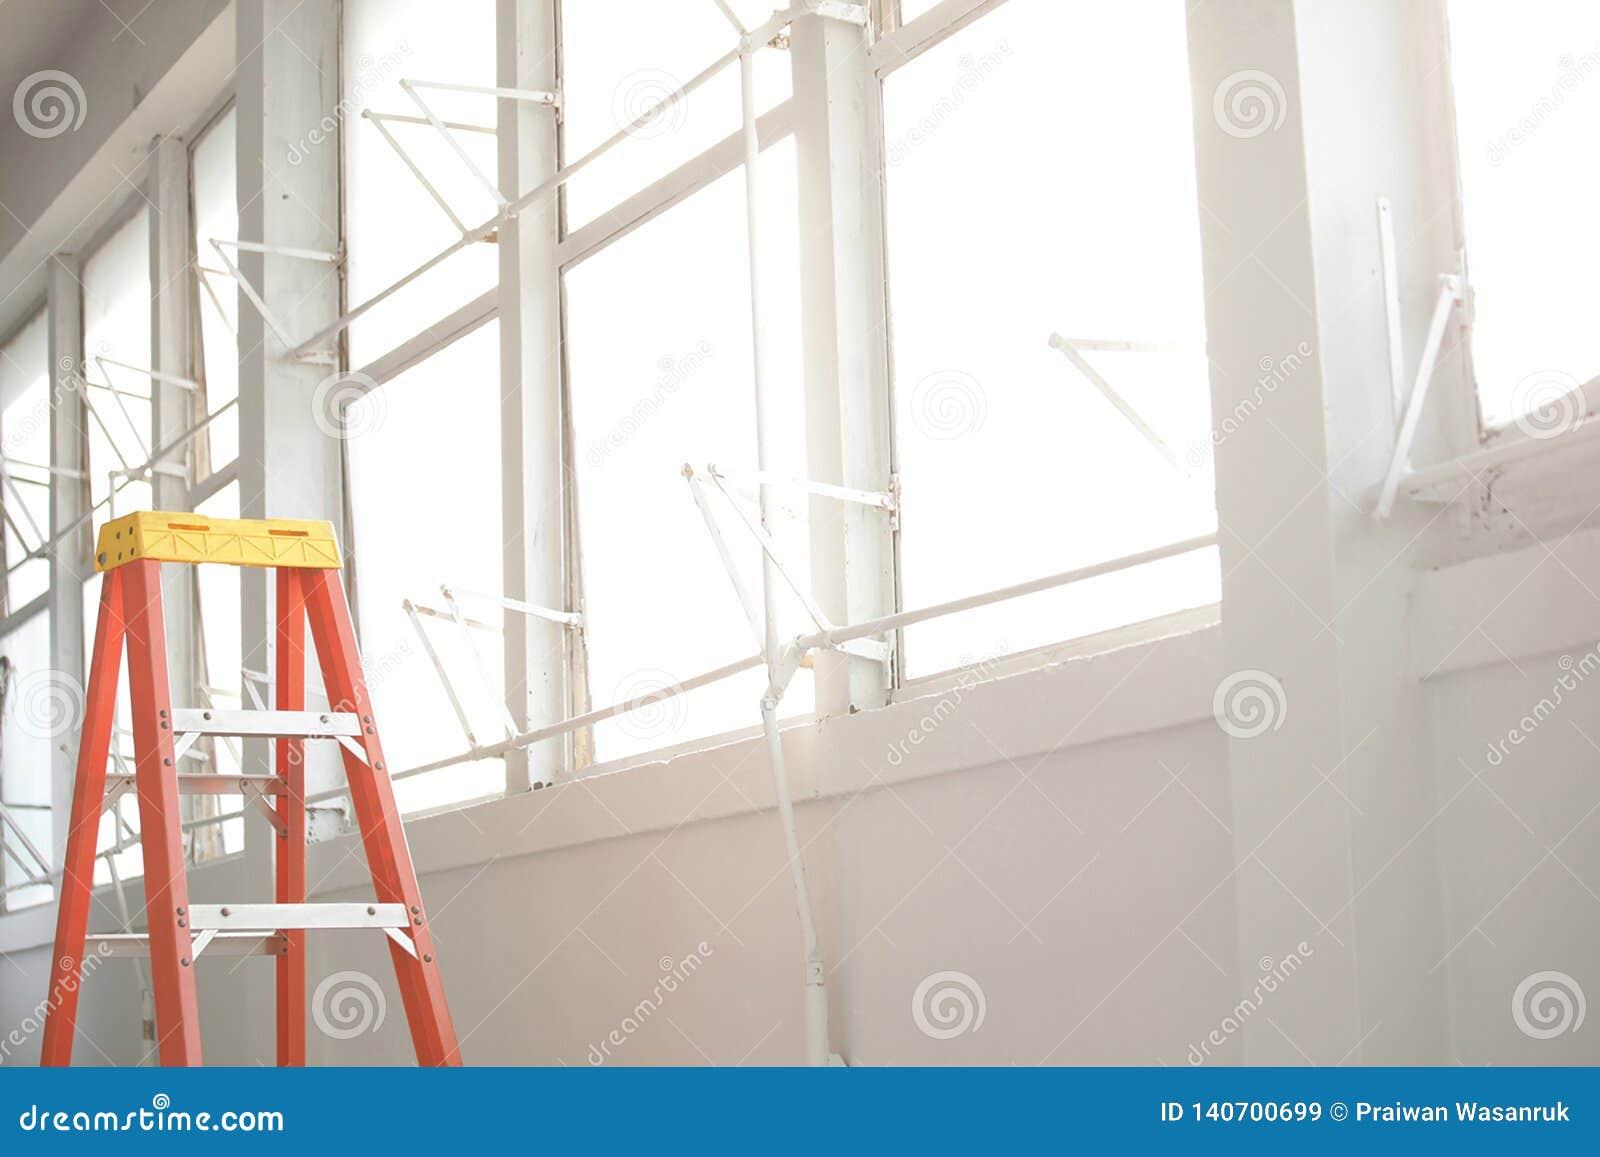 Orange stege på det vita fönsterhallet